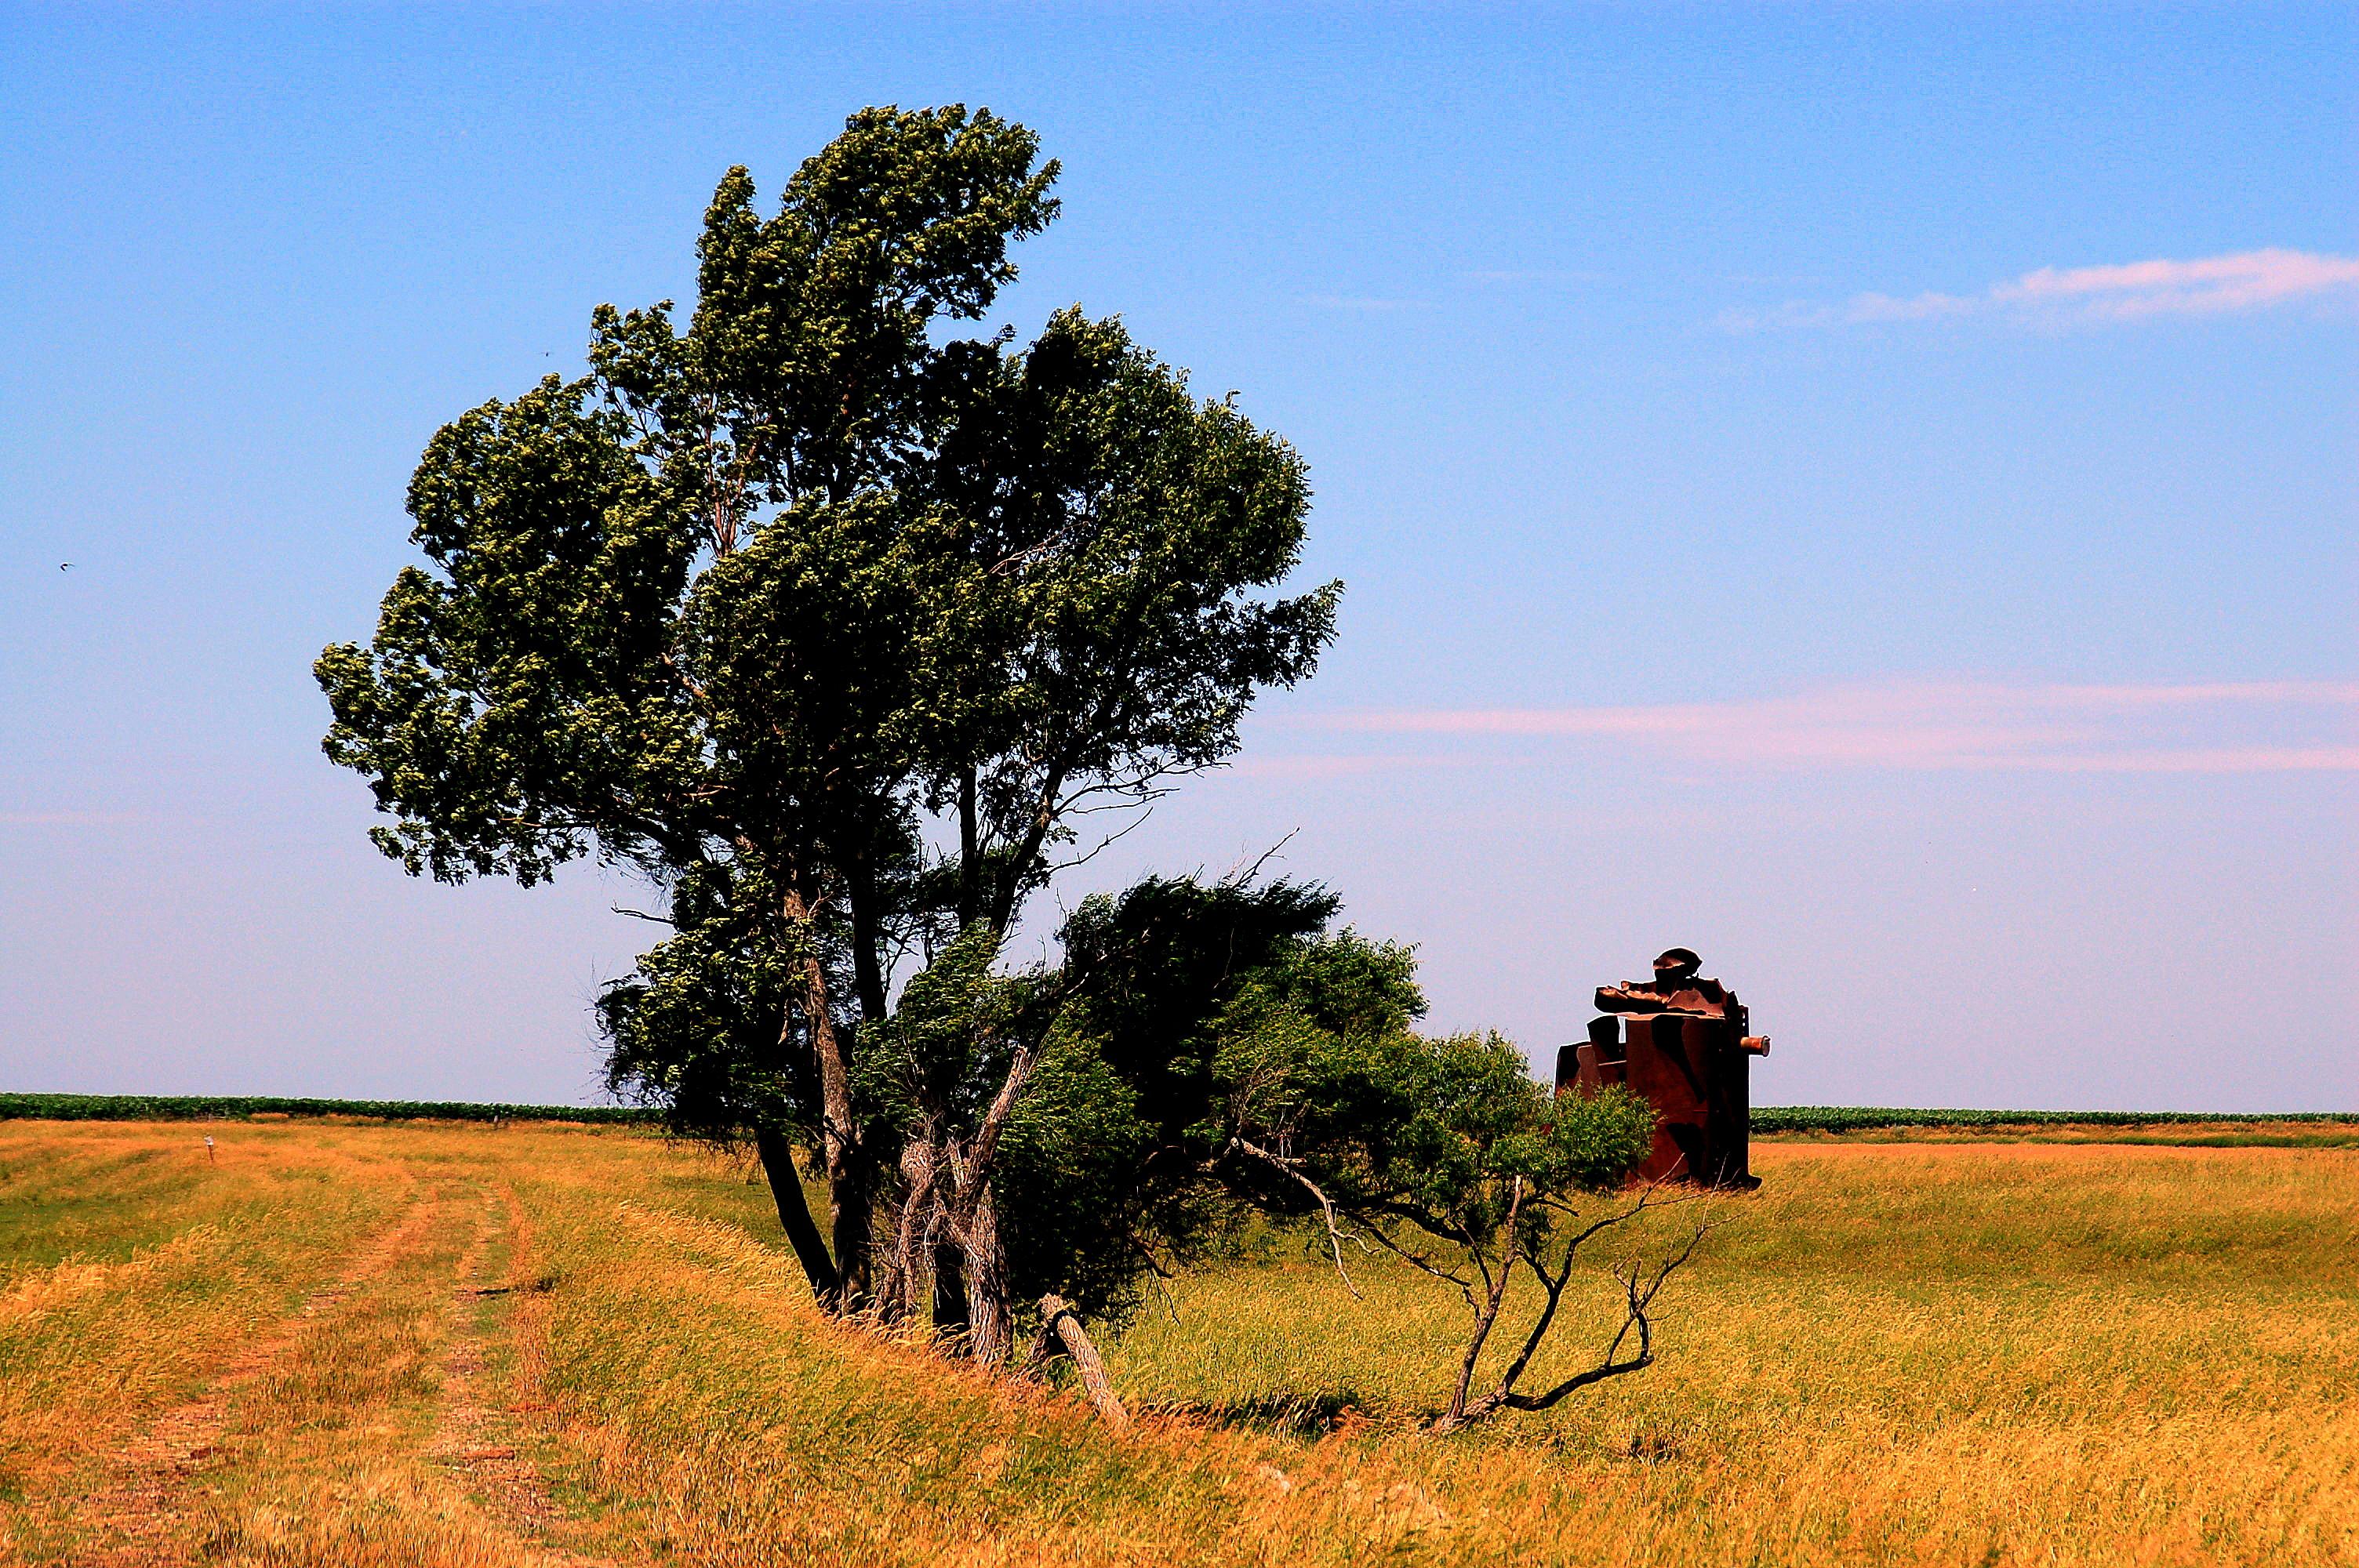 South dakota spink county doland - Clarksd To The Field Sd